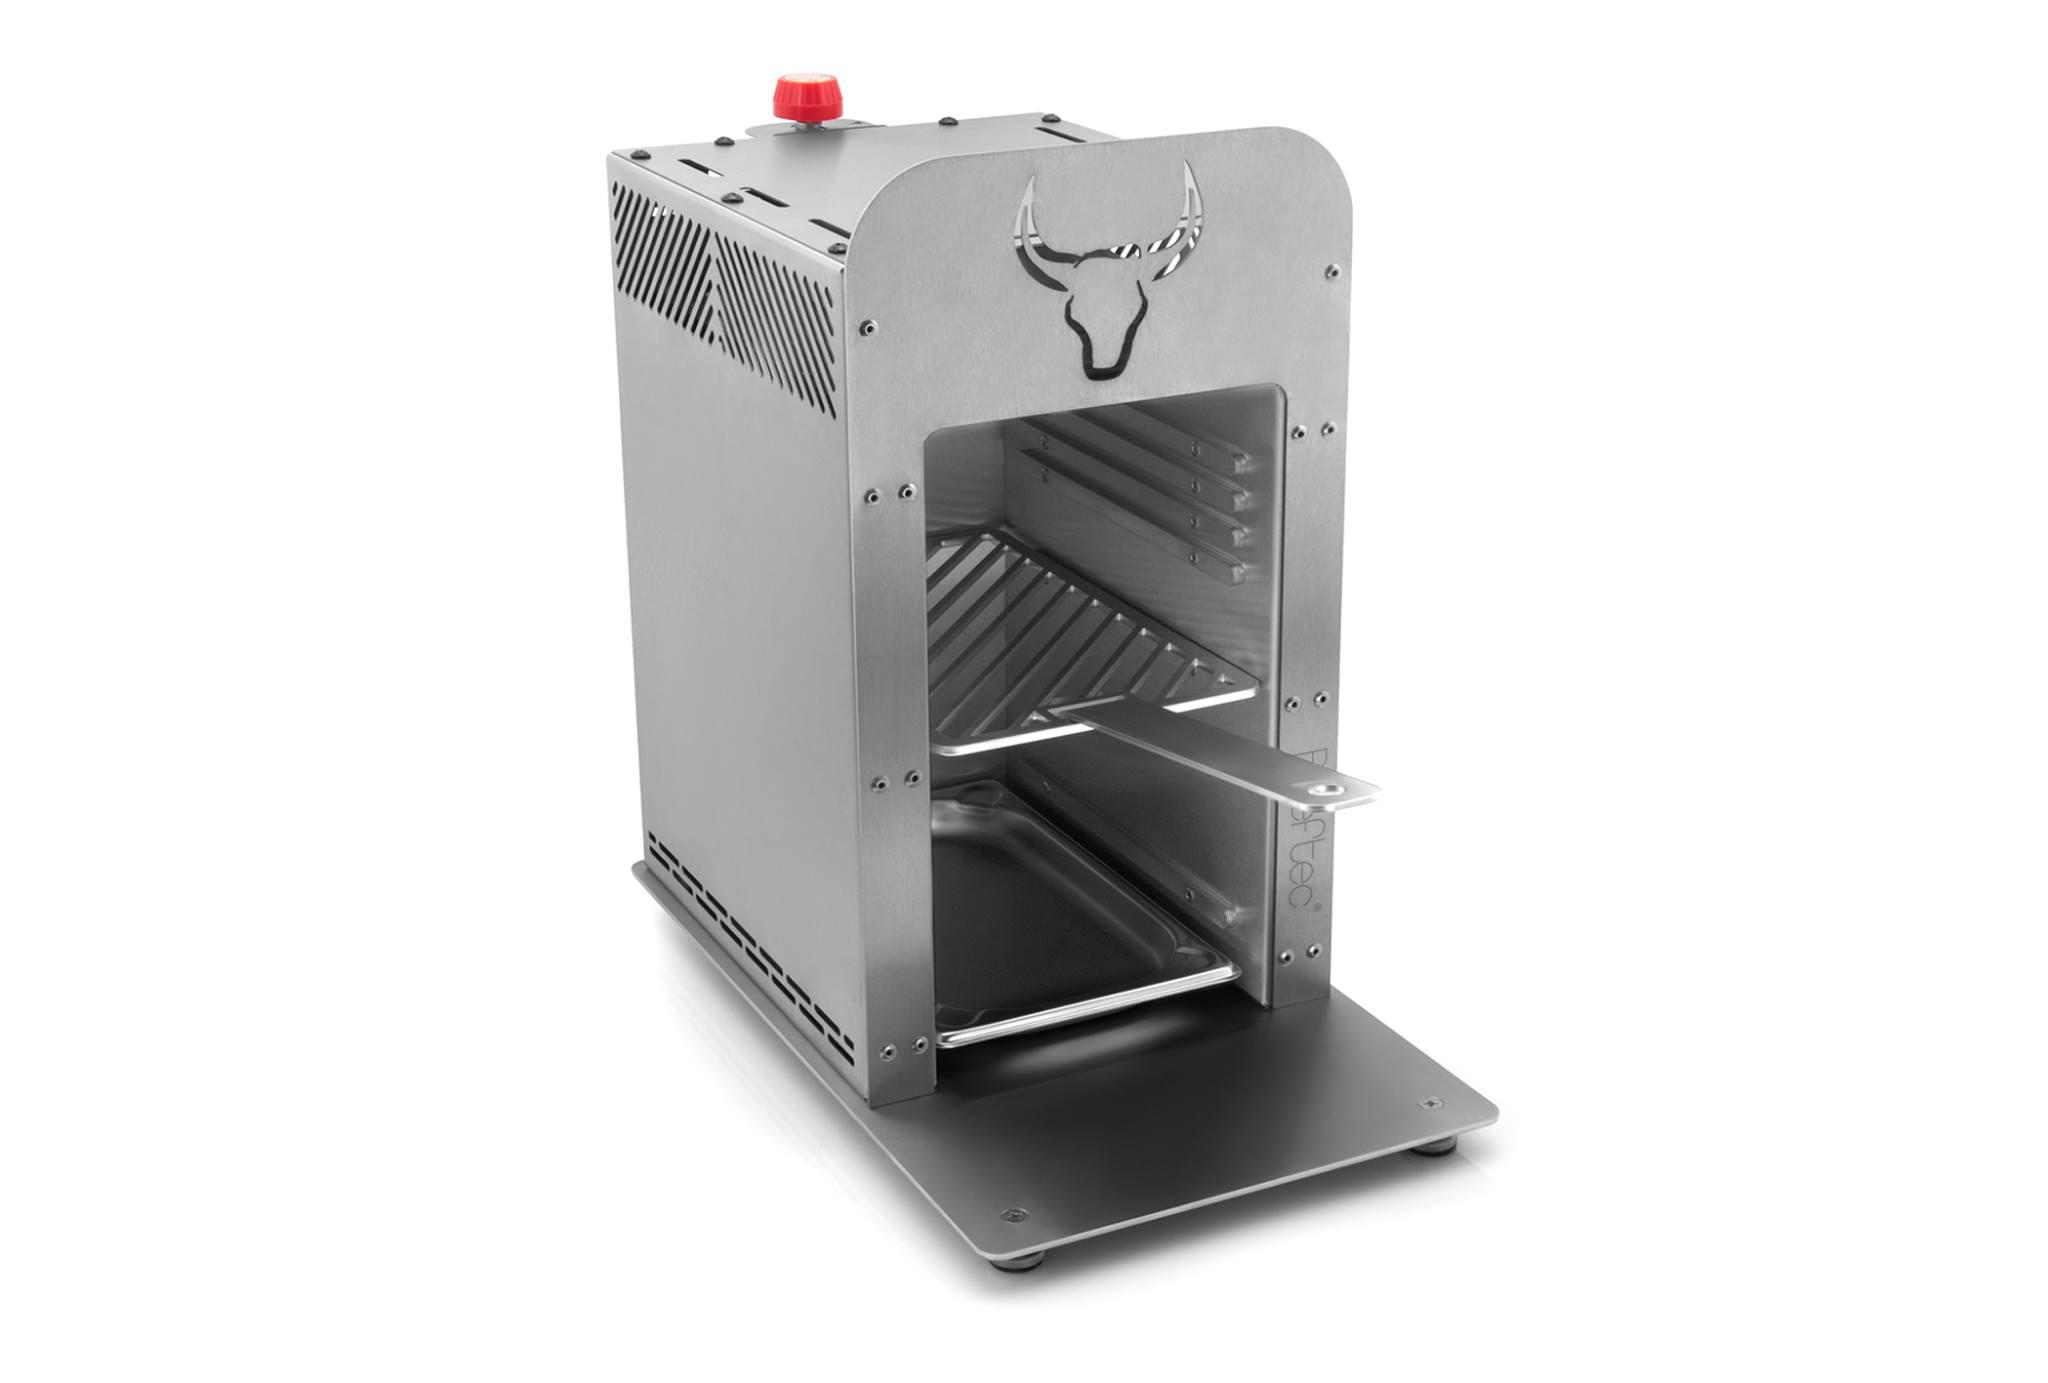 Rösle Gasgrill Buddy : Tischgrill gasgrills grills bbqsaloon grill shop